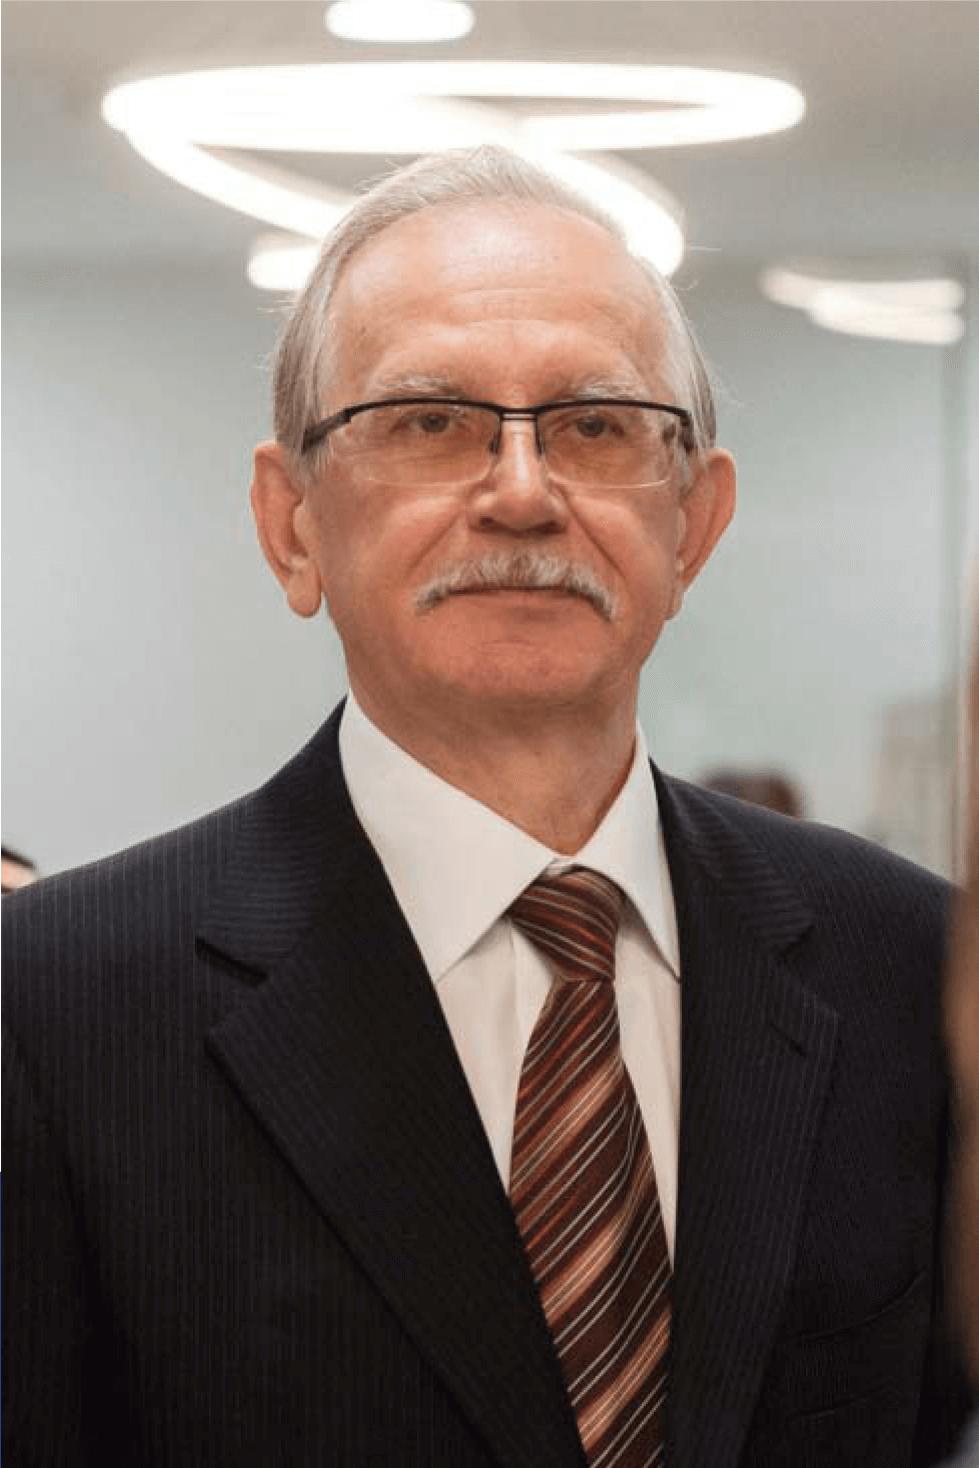 Абирег: Александр Соловьев: «Серым кардиналом я не буду»